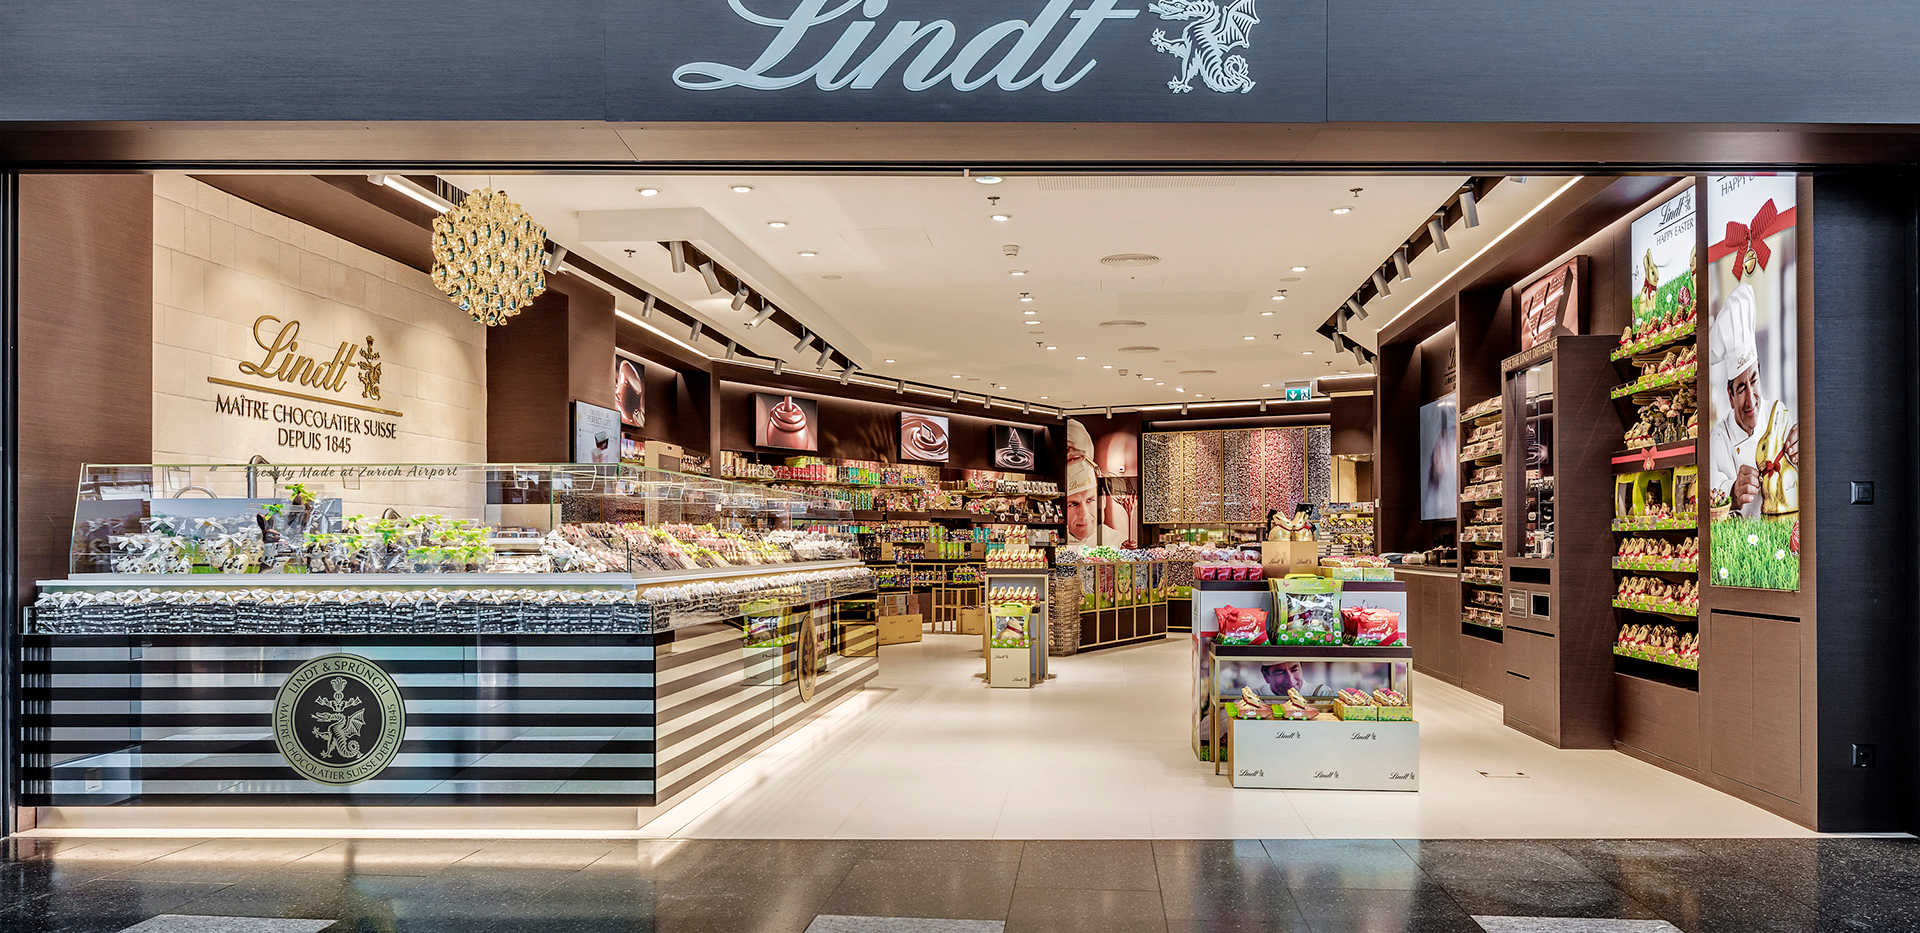 Lindt_Shop_Airport_Kloten_©_R_02.jpg